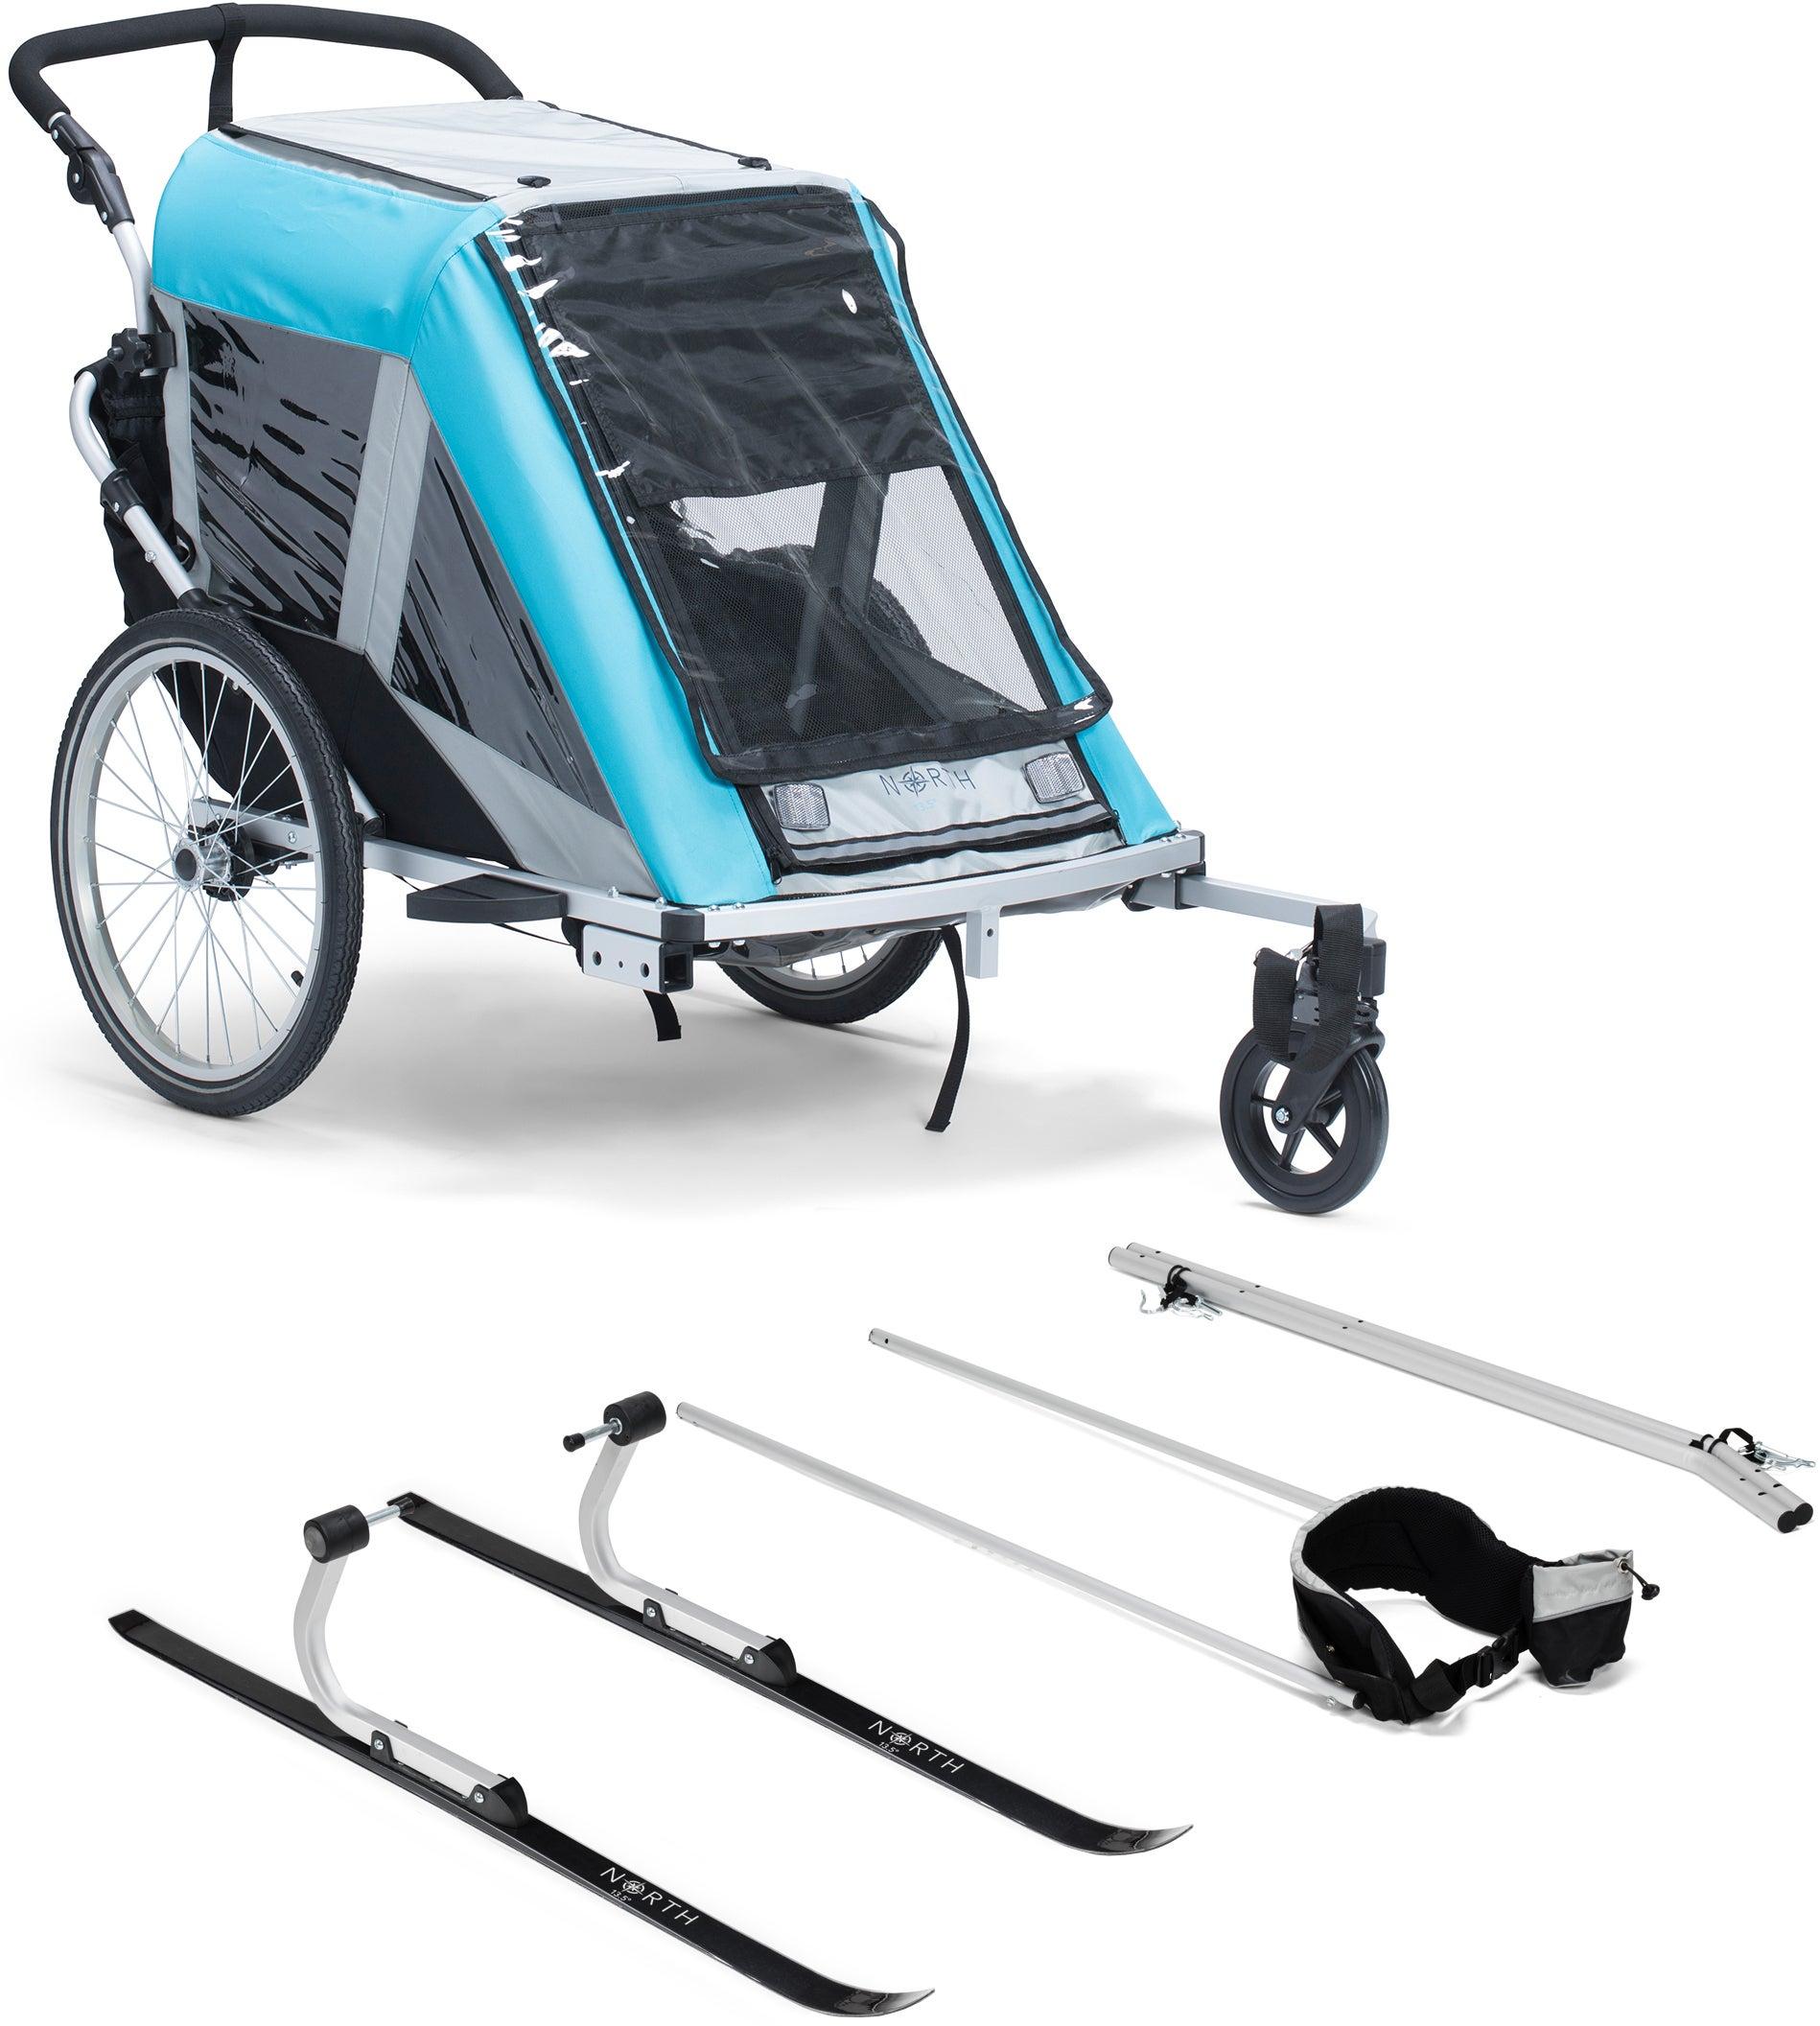 North 13.5 Roadster+ Cykelvagn, Blue Inkl. Skidset